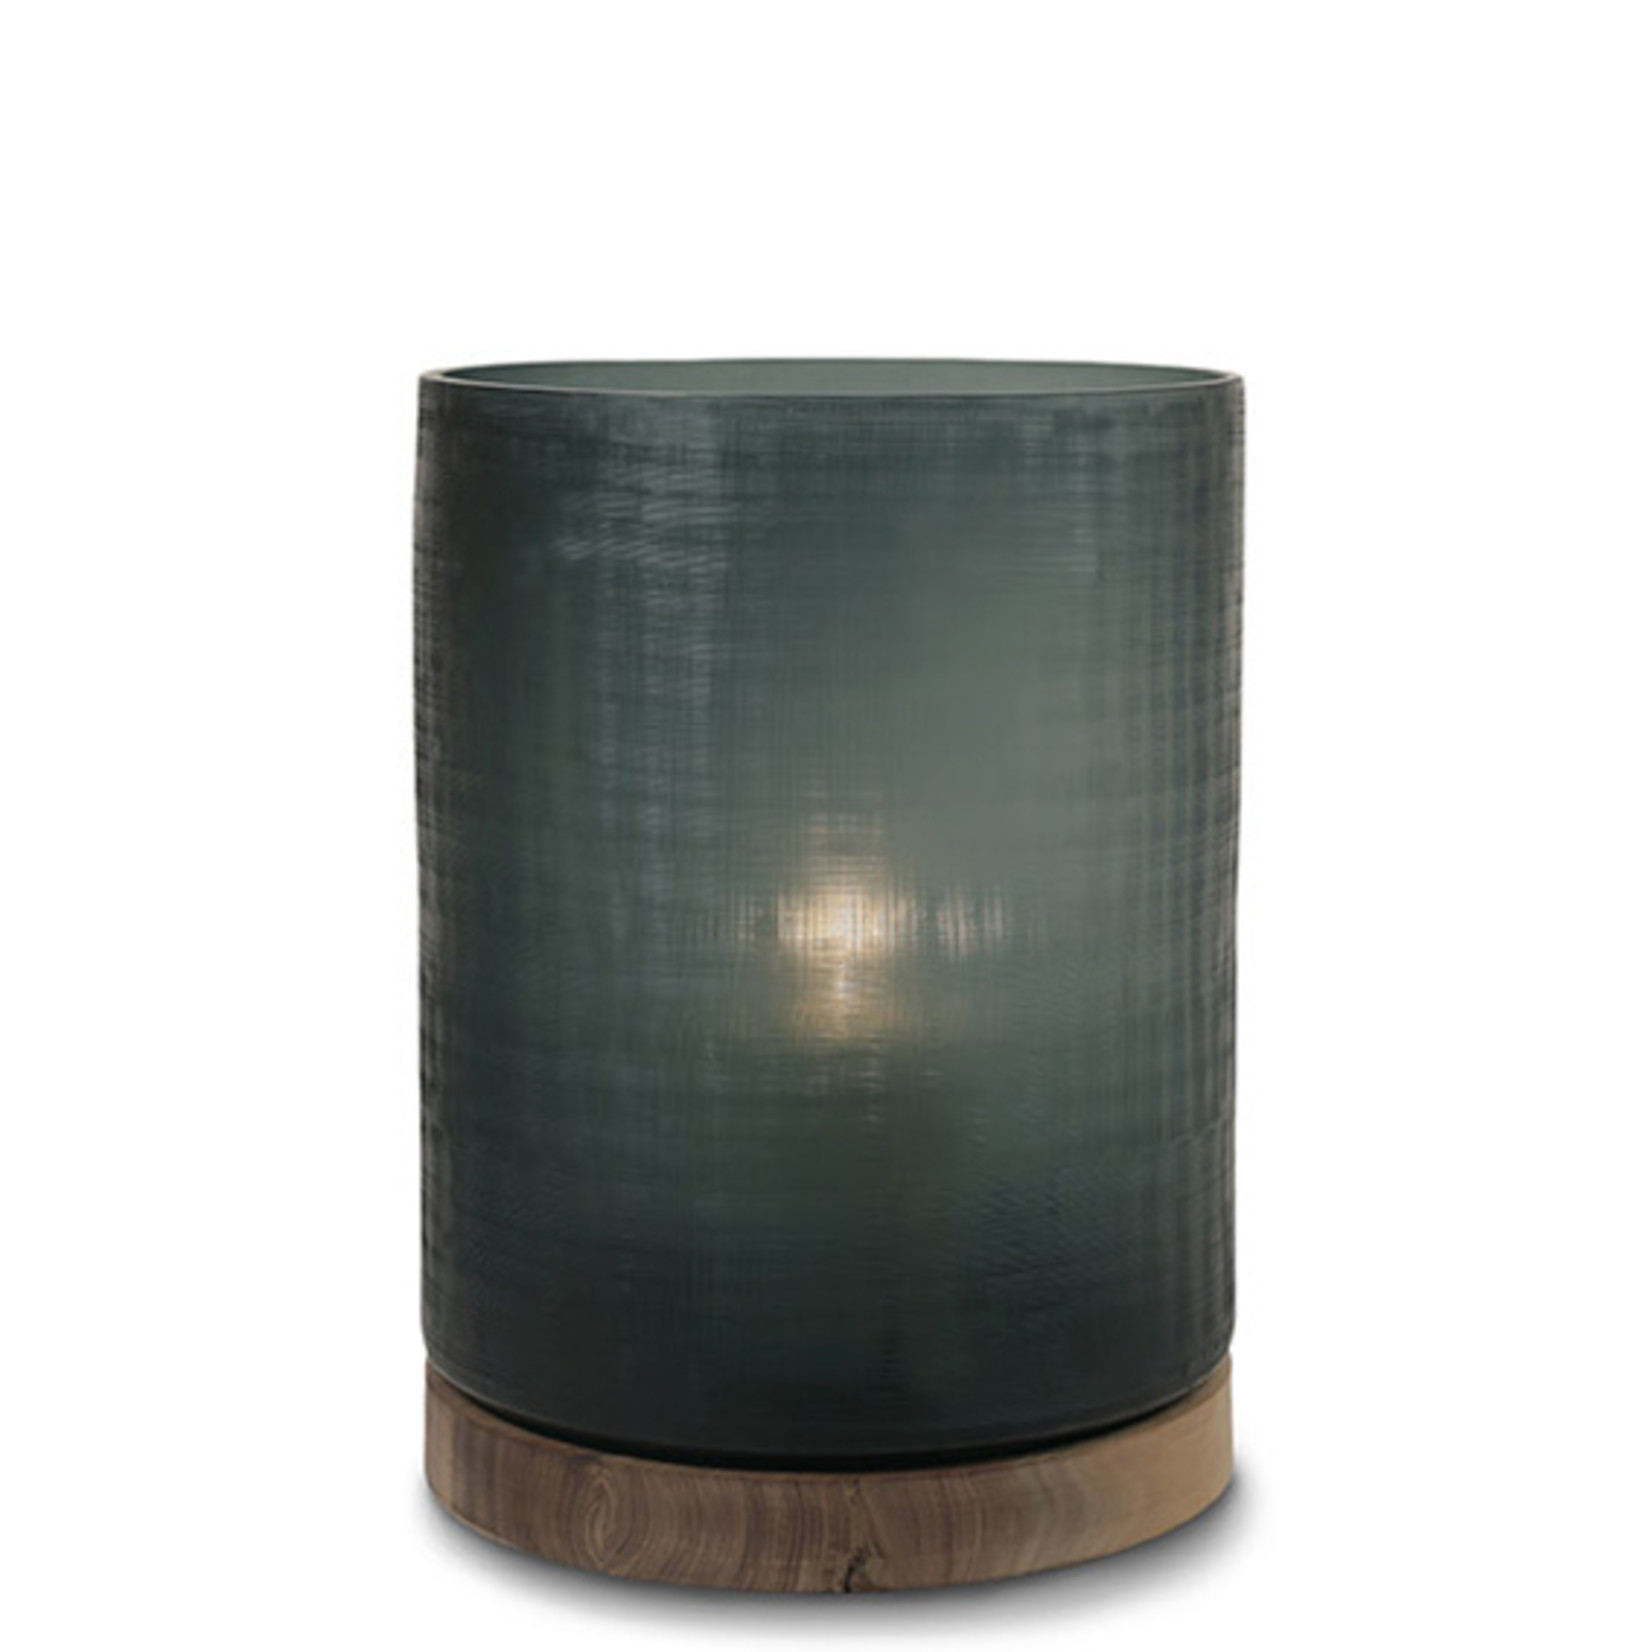 Guaxs Lantern Aran XL | Dark Indigo / Walnut